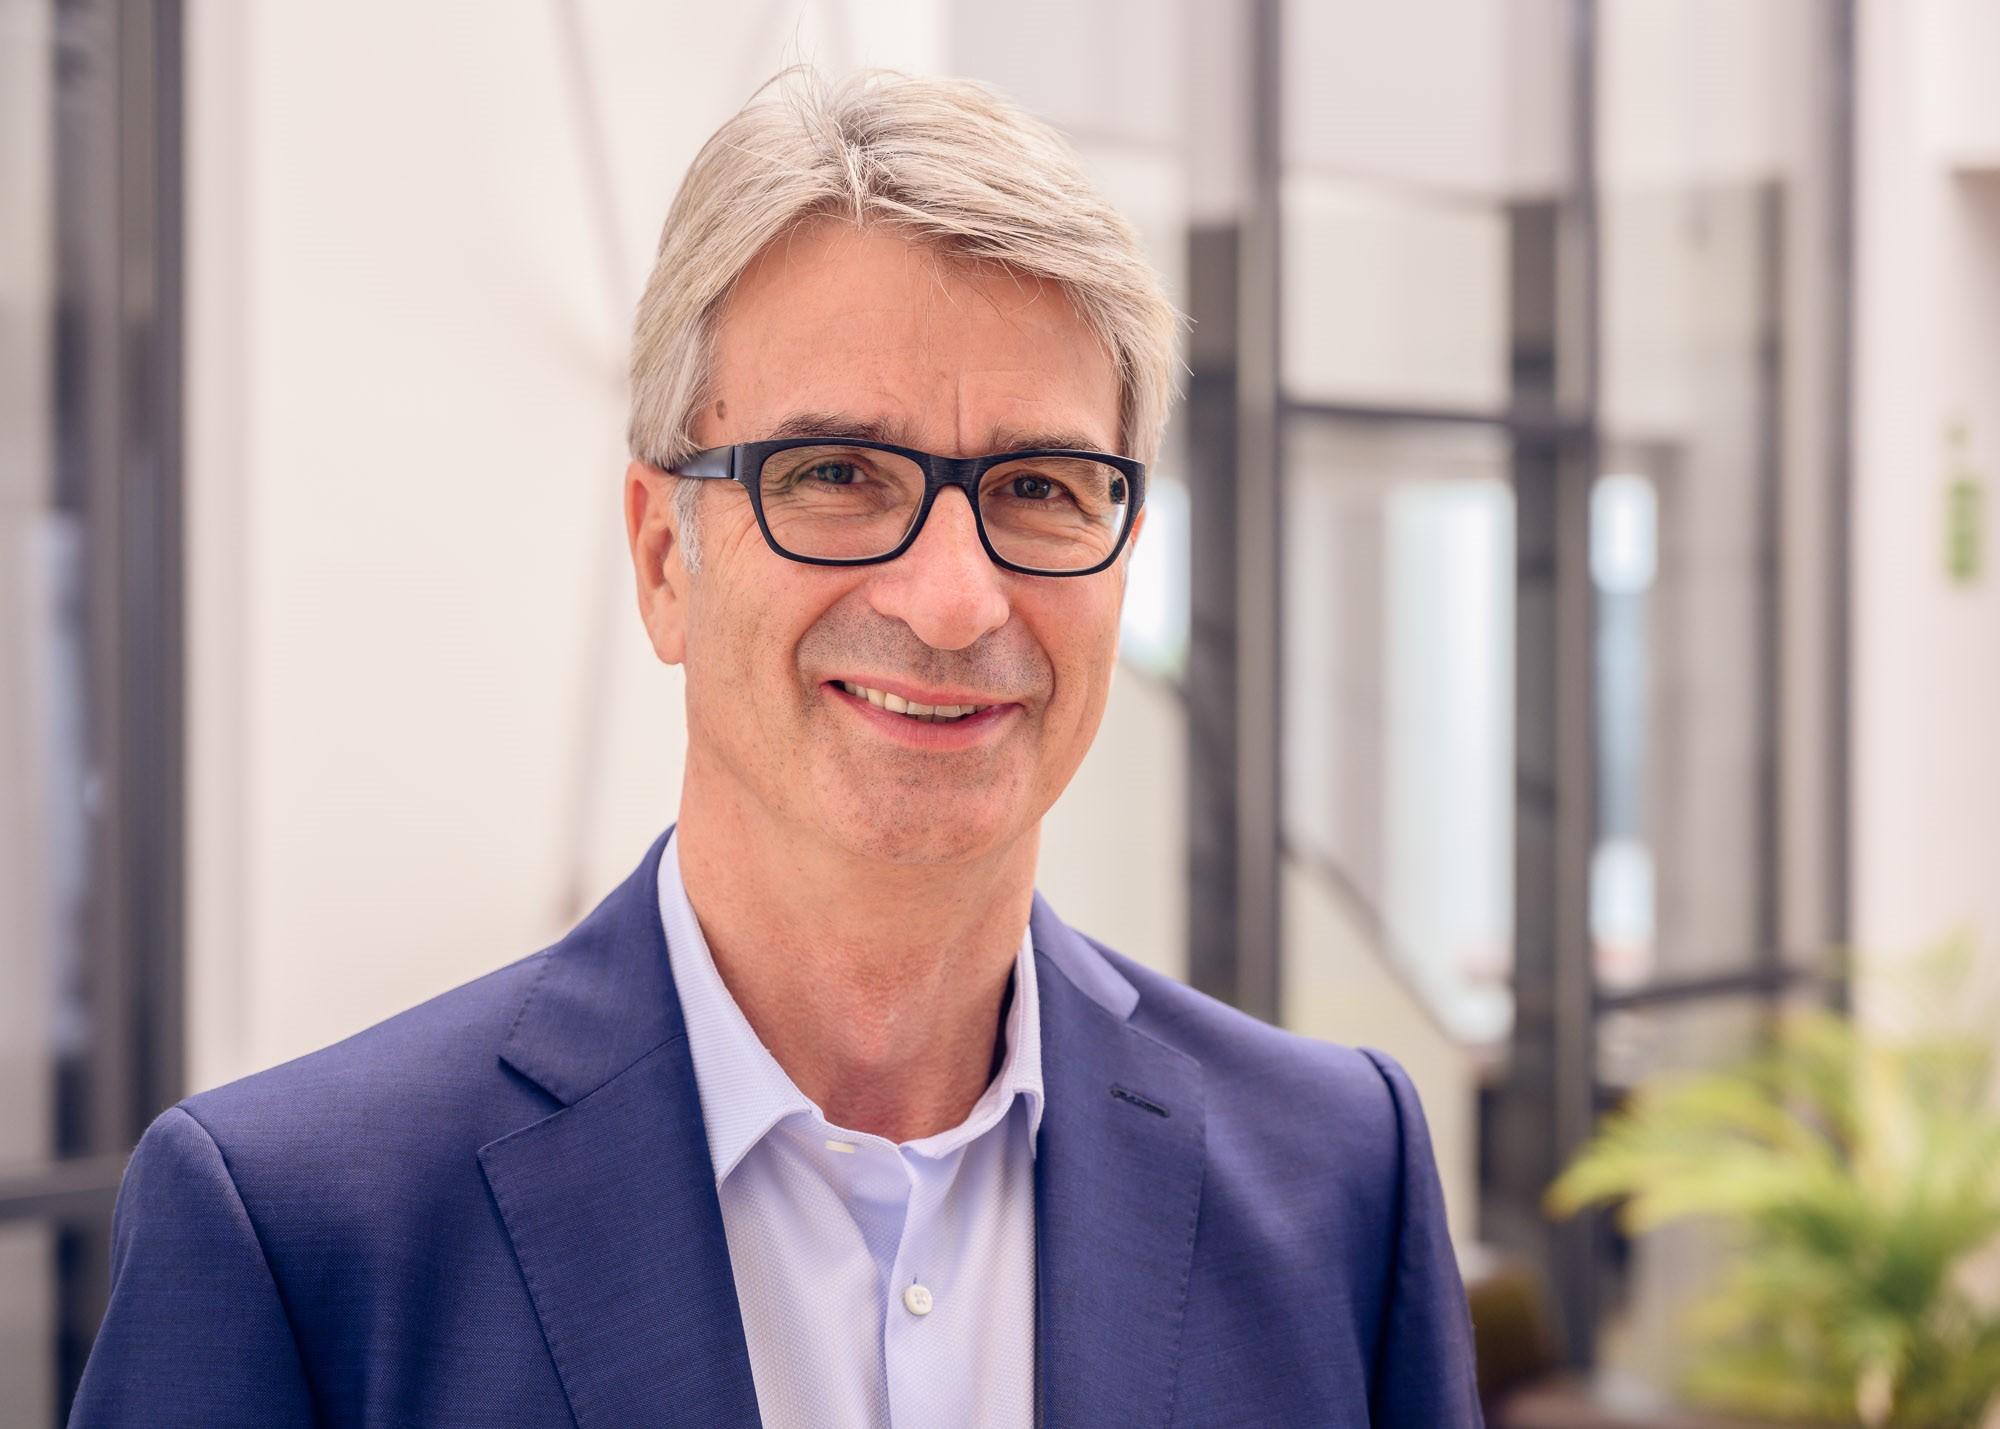 Rainer Huethorst